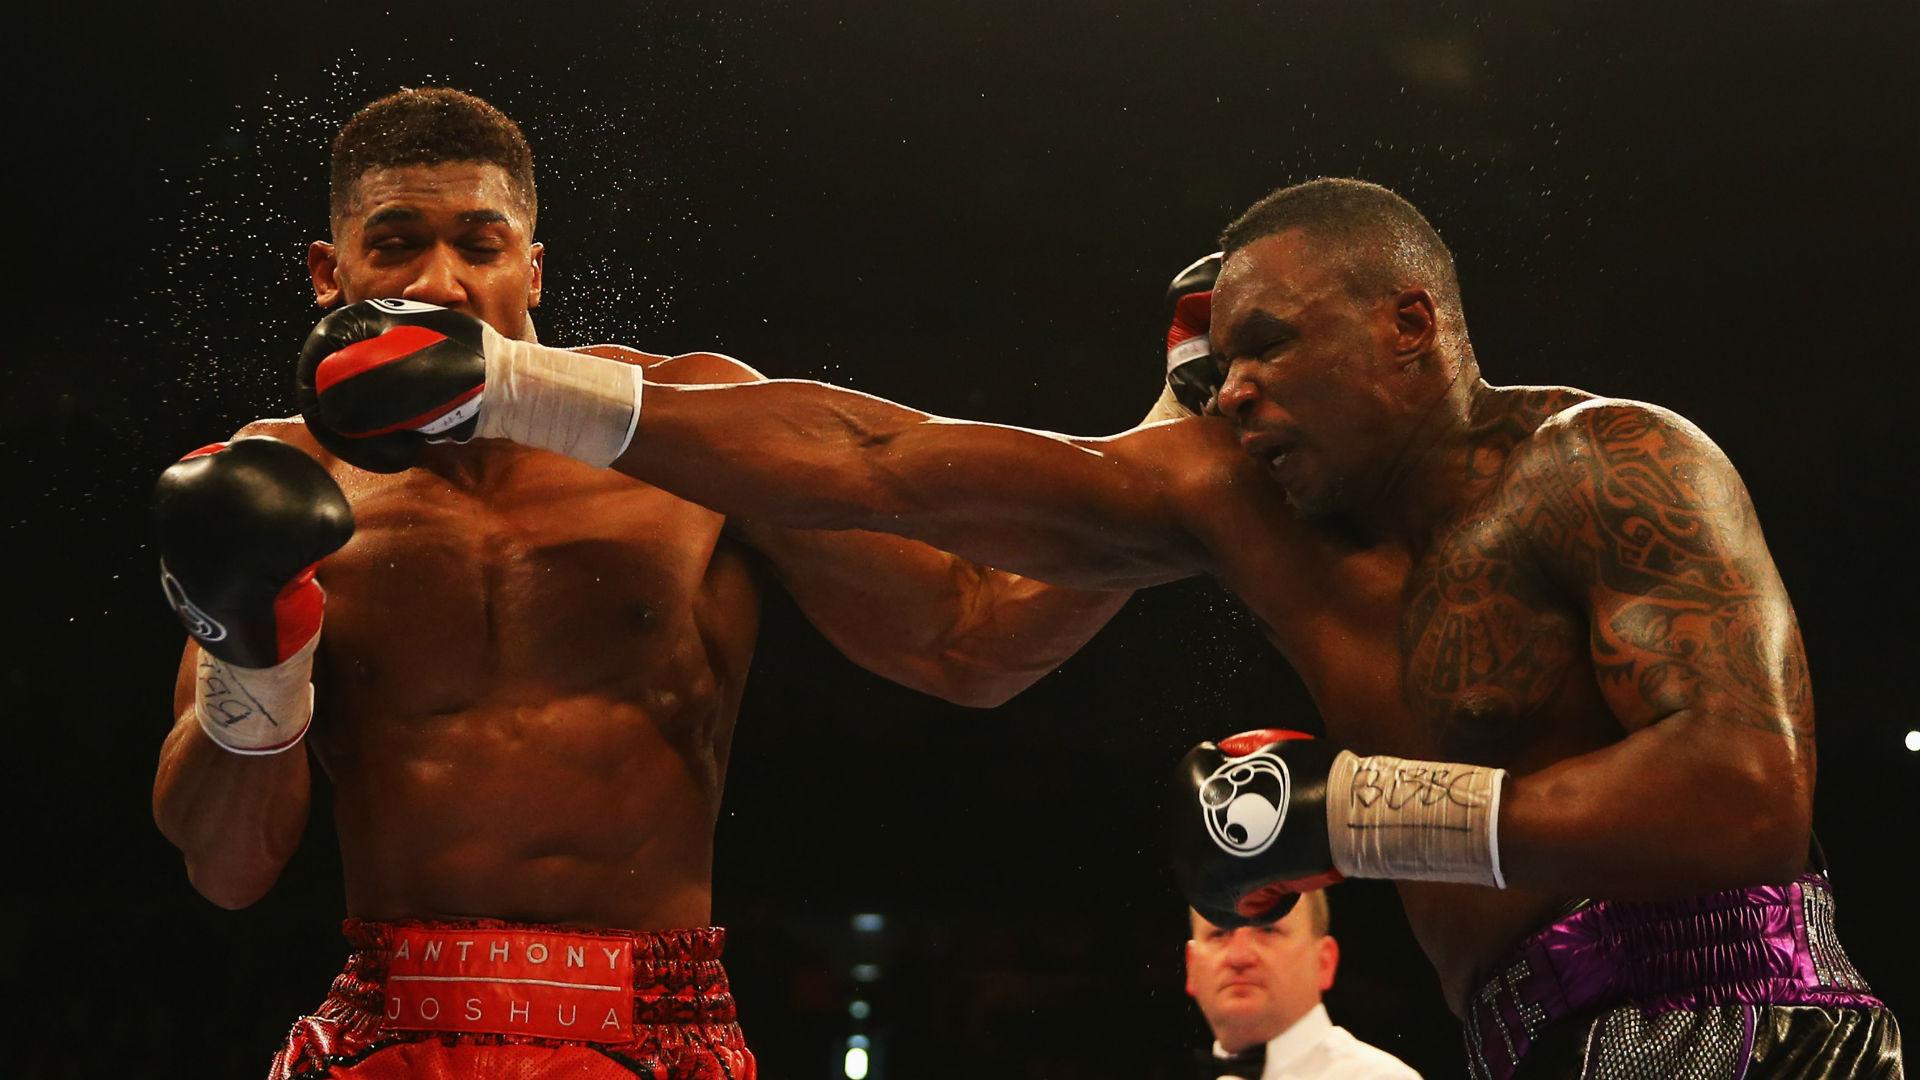 Anthony Joshua talks rubbish - Dillian Whyte slams rival for Tyson Fury sparring saga